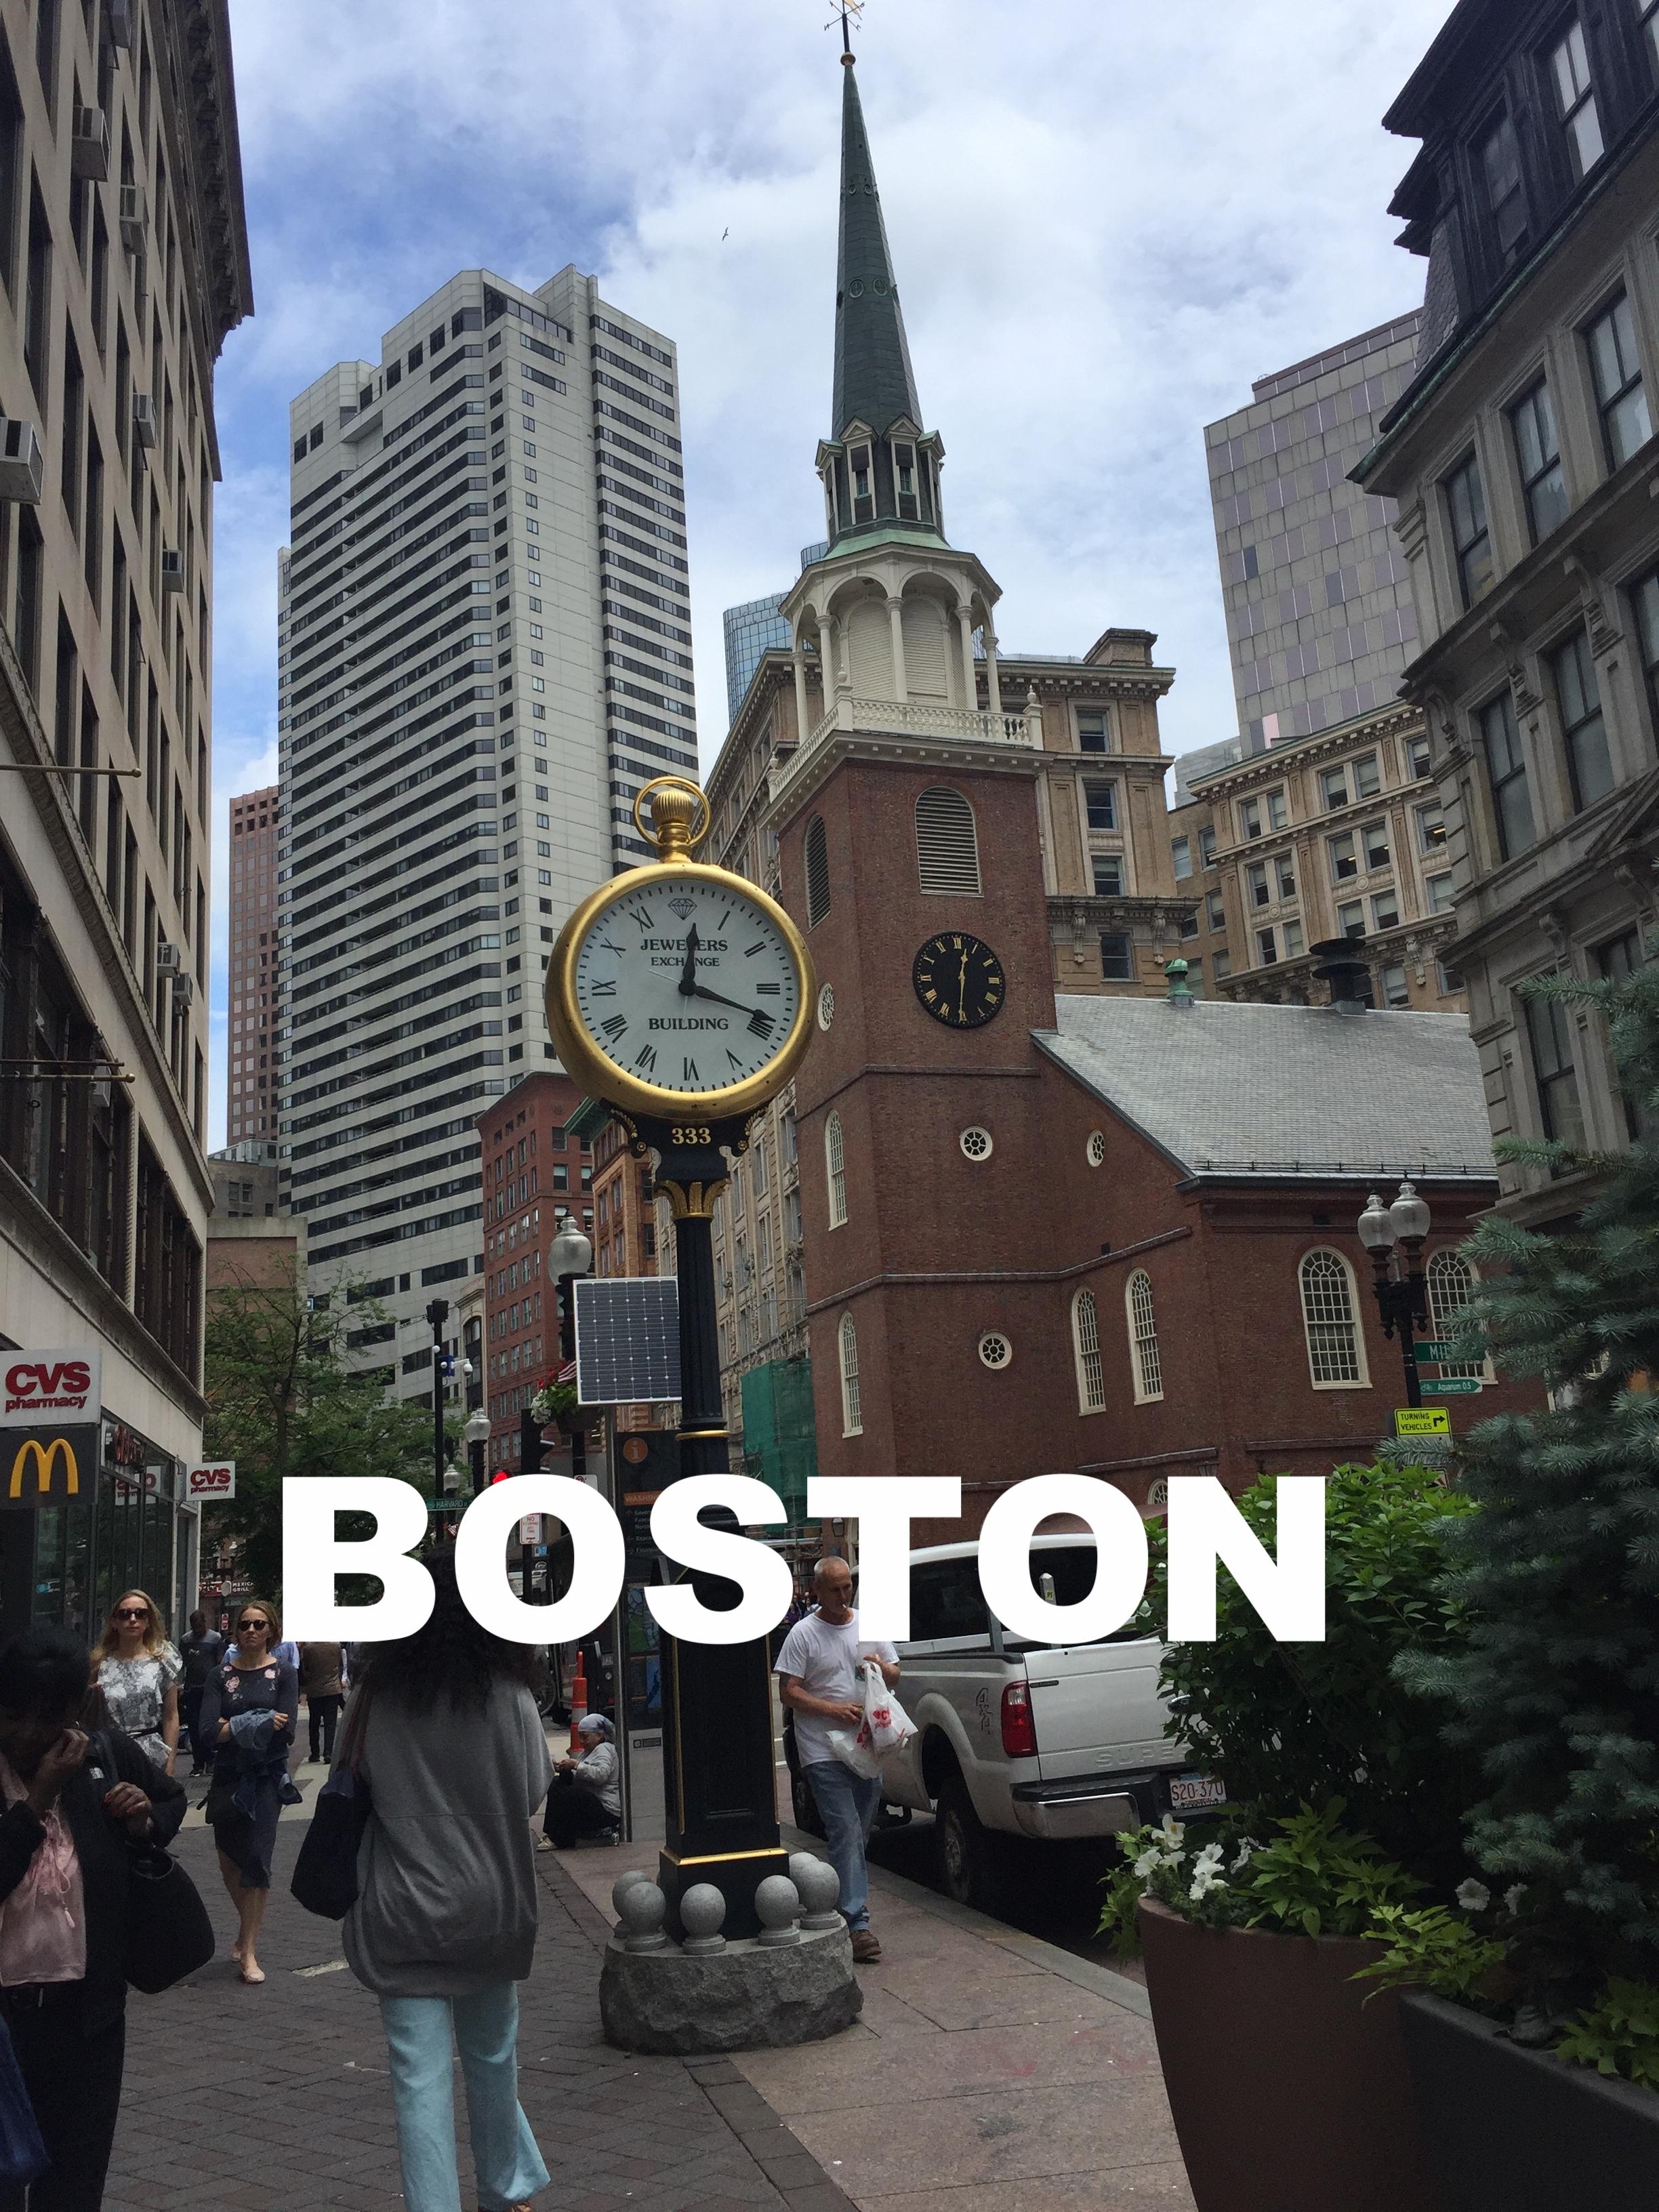 Boston. Photo Credit: Chloe Barran